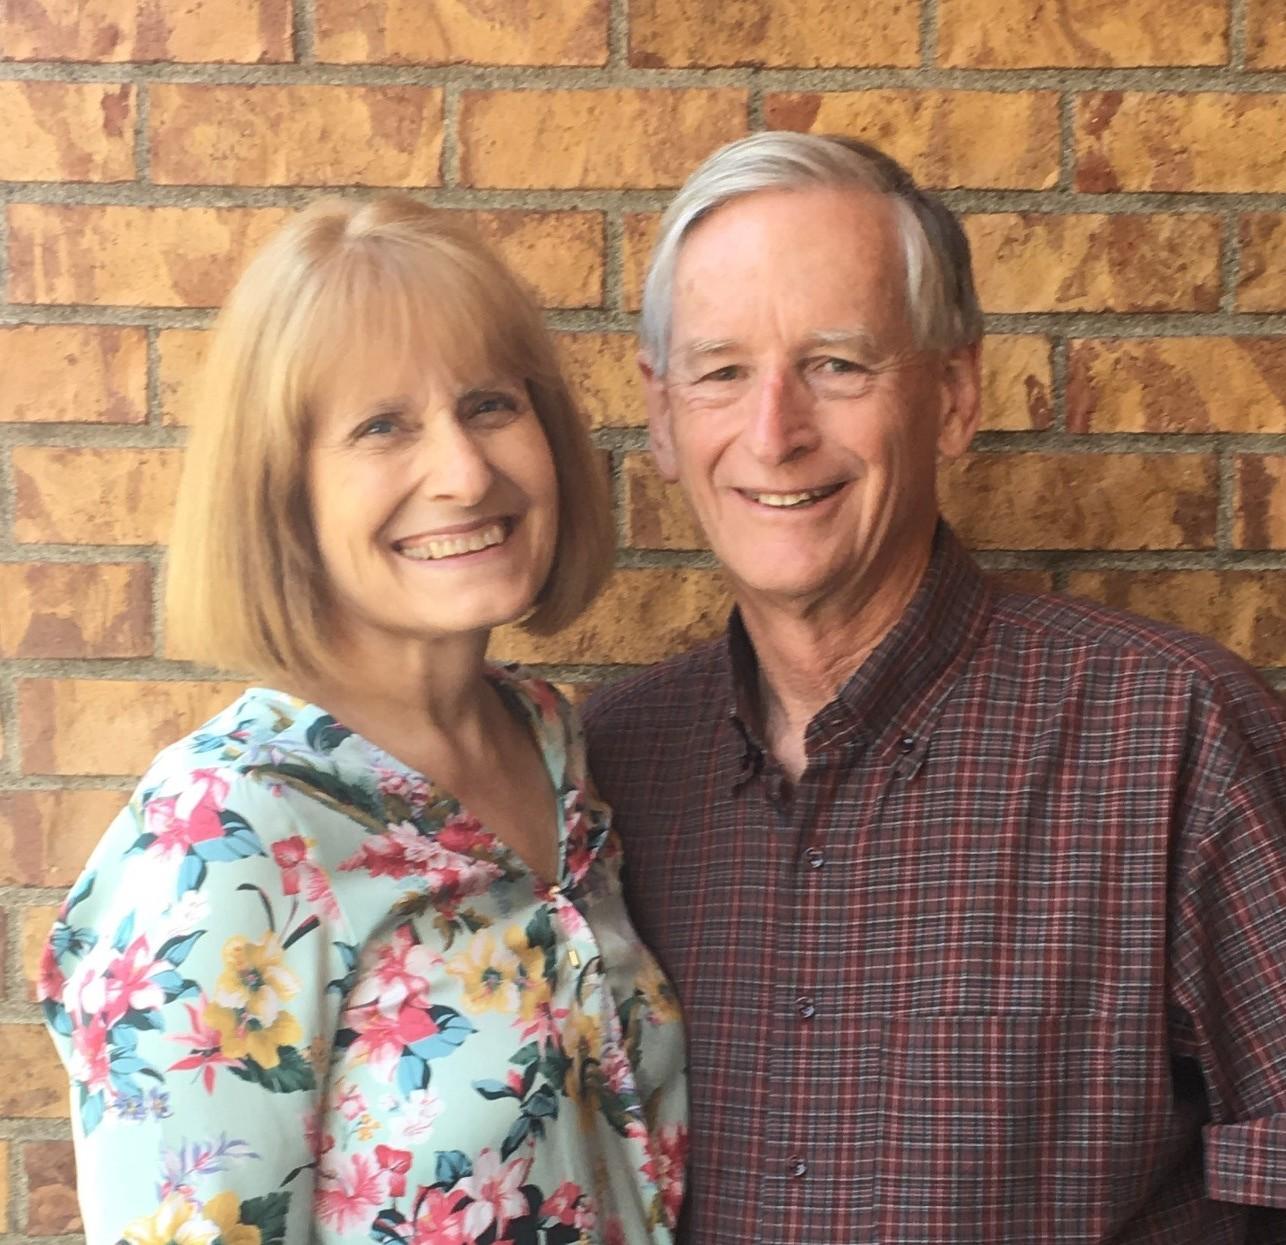 Steve and Cathy Crawford